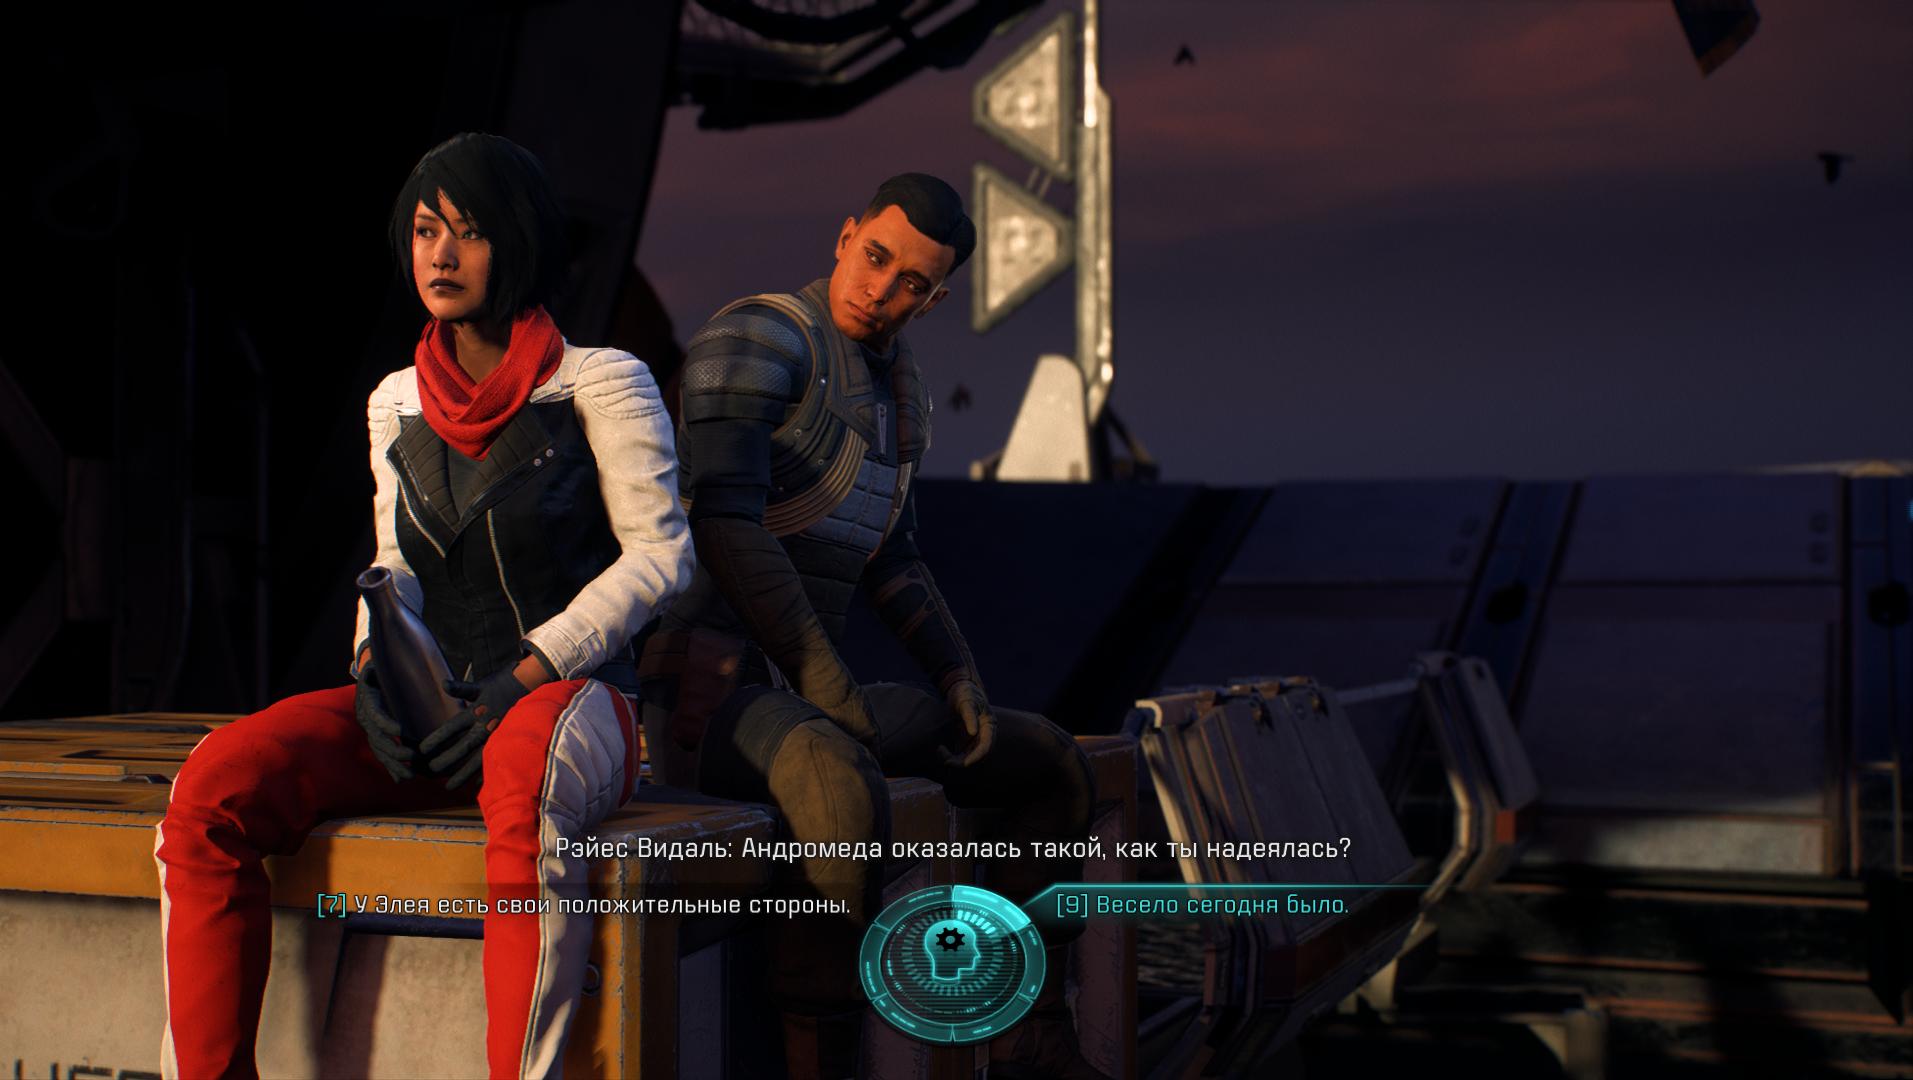 2017-12-04 04_06_14-Mass Effect™_ Andromeda.png - Mass Effect: Andromeda